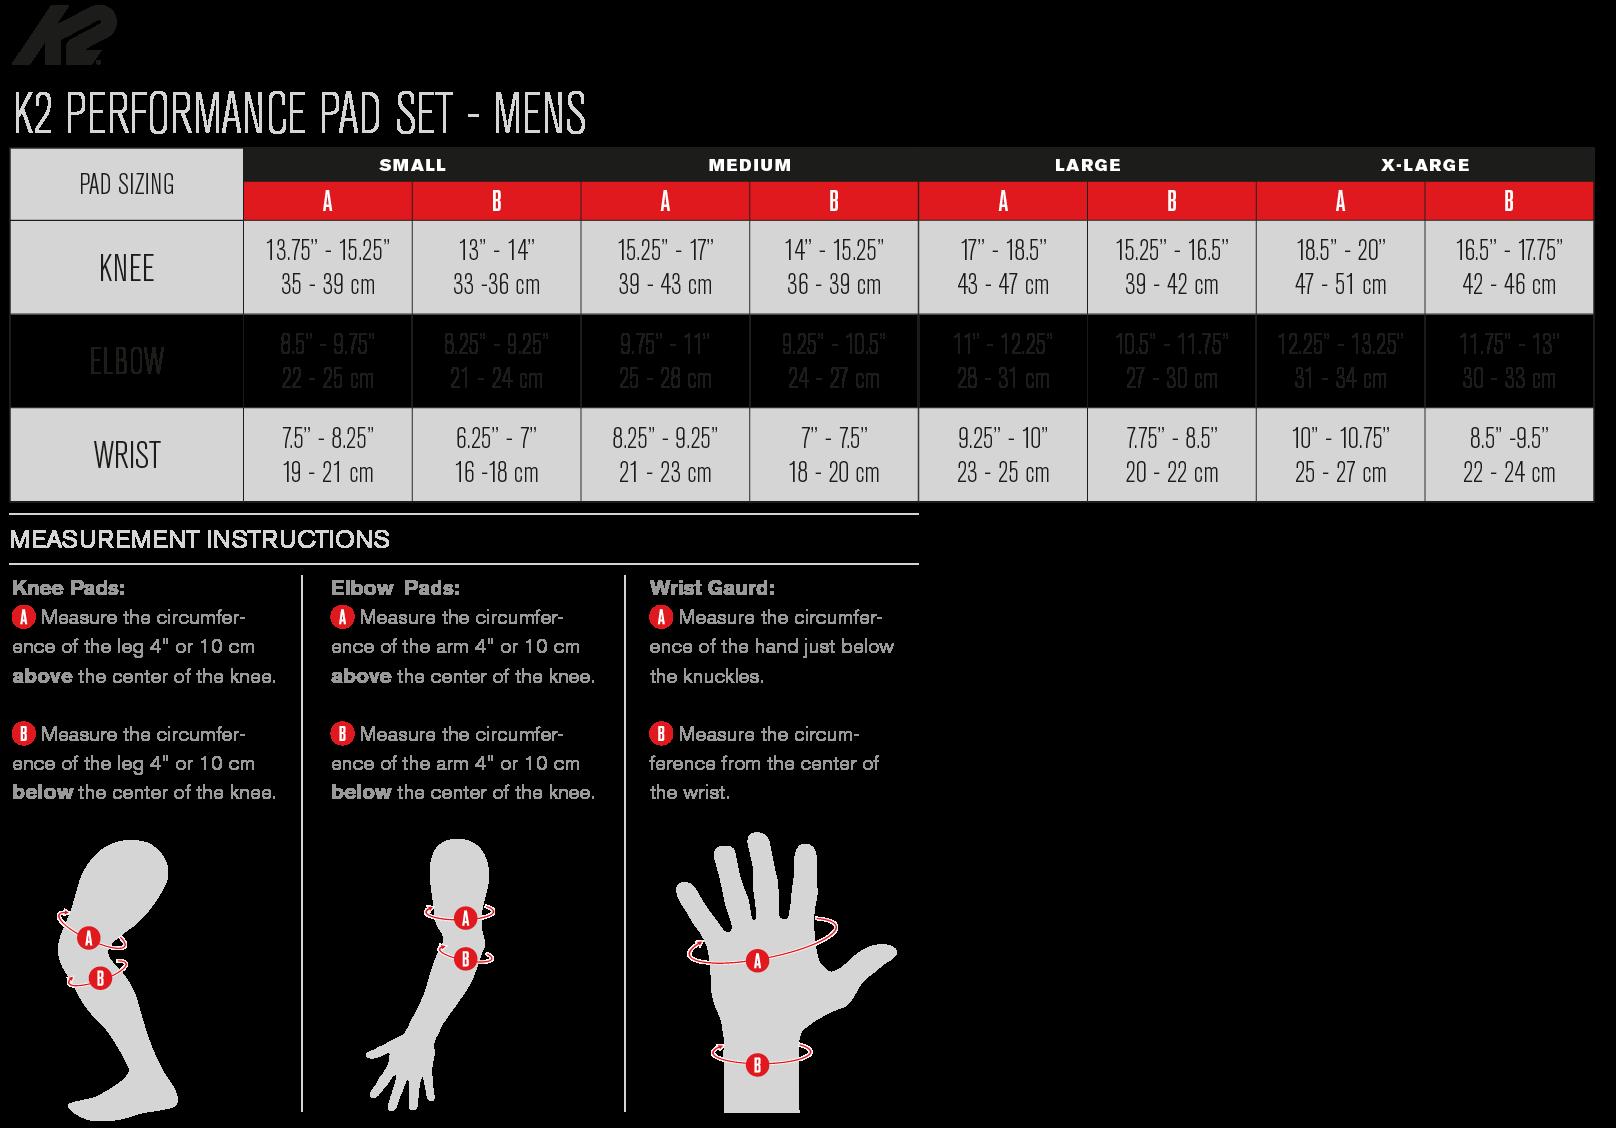 K2 Performance Pad Size Chart